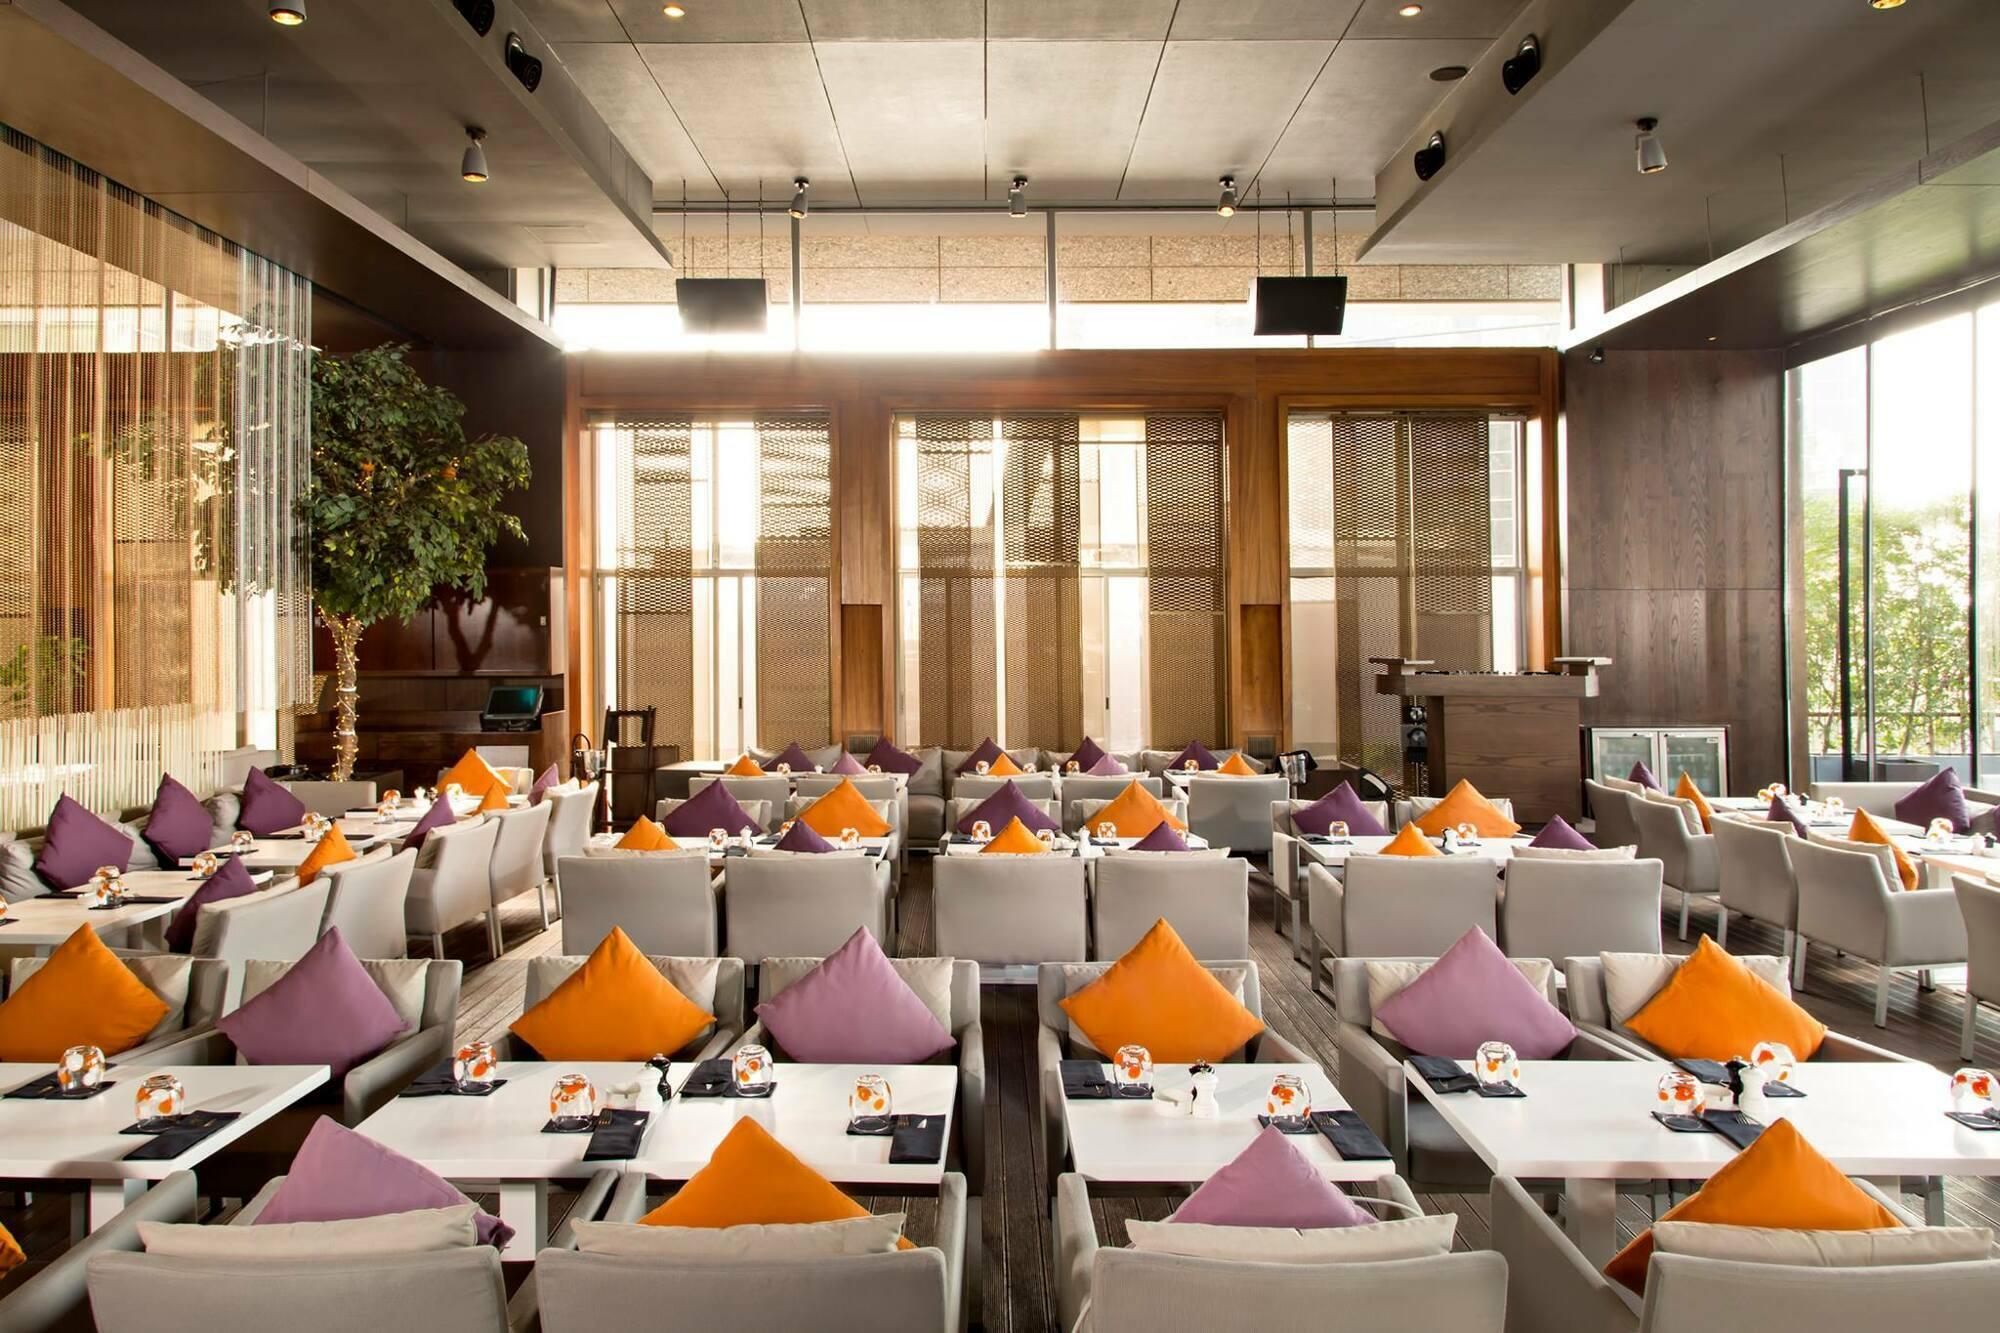 Restaurant met meubilair